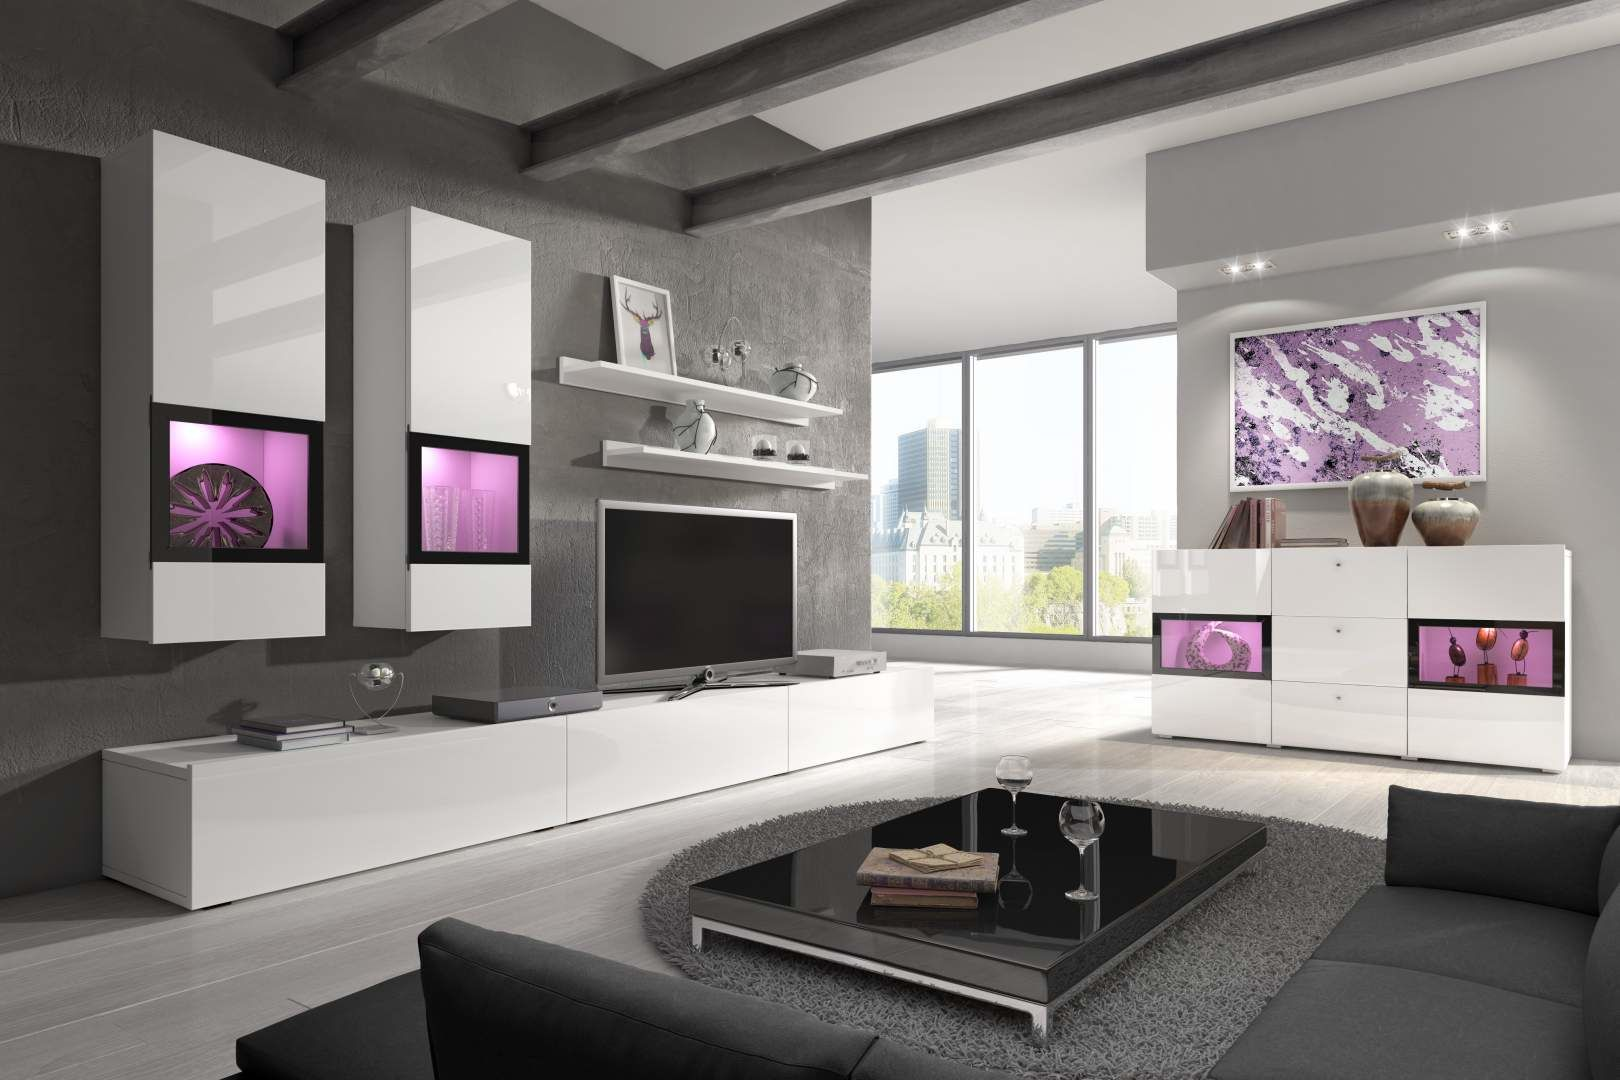 Obývací sestava BAROS 10 bílá